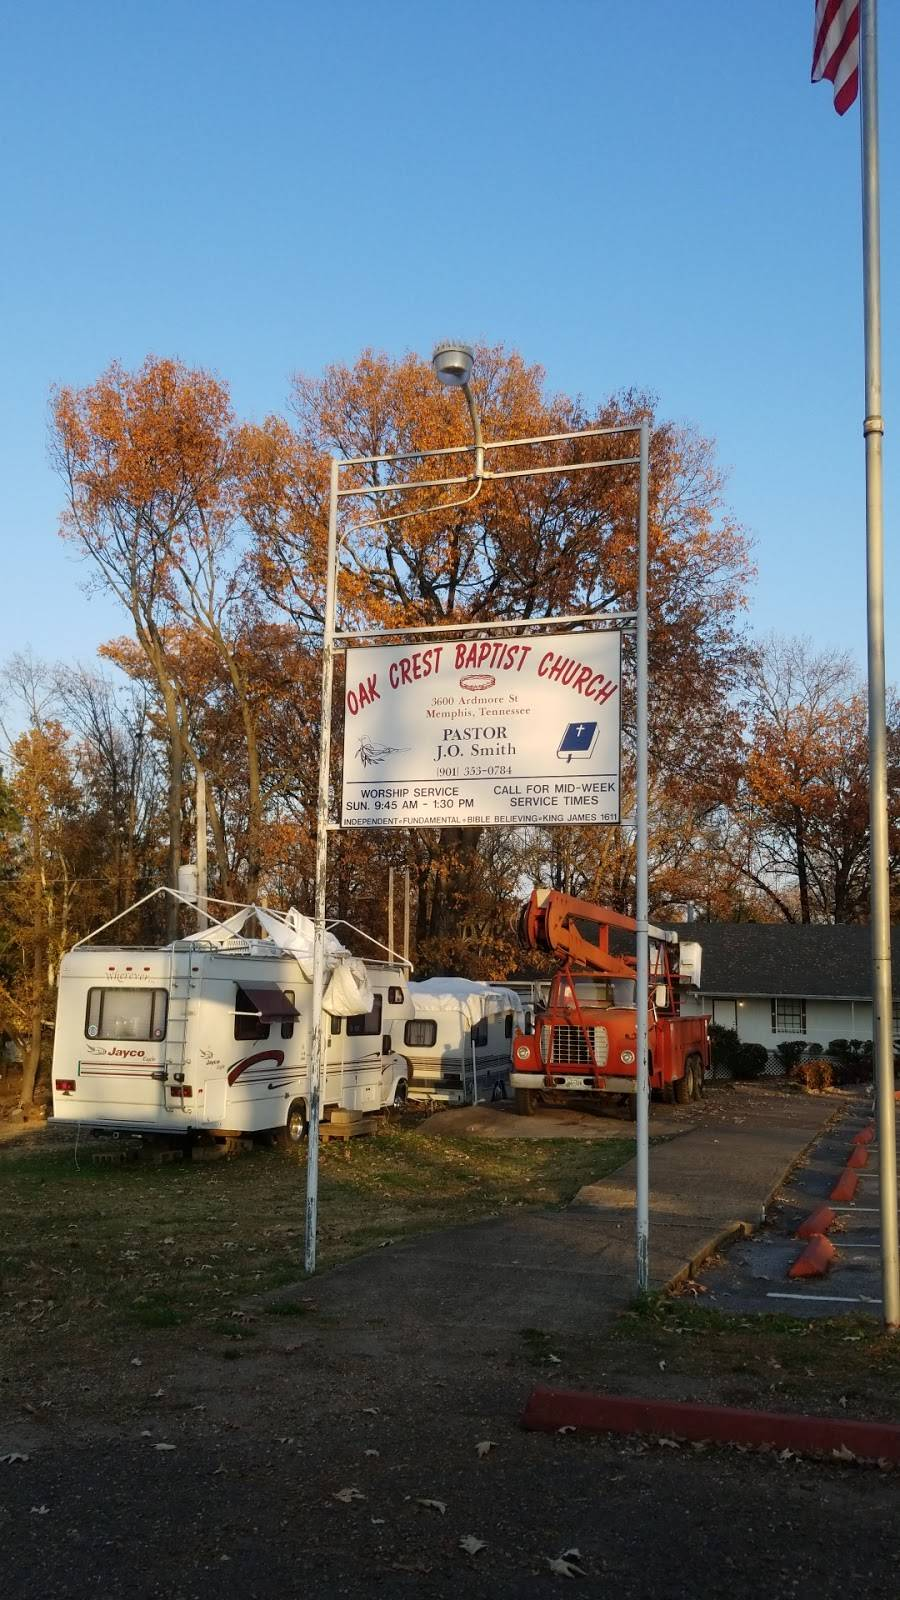 Oakcrest Baptist Church - church  | Photo 2 of 2 | Address: 3600 Ardmore St, Memphis, TN 38127, USA | Phone: (901) 353-0784